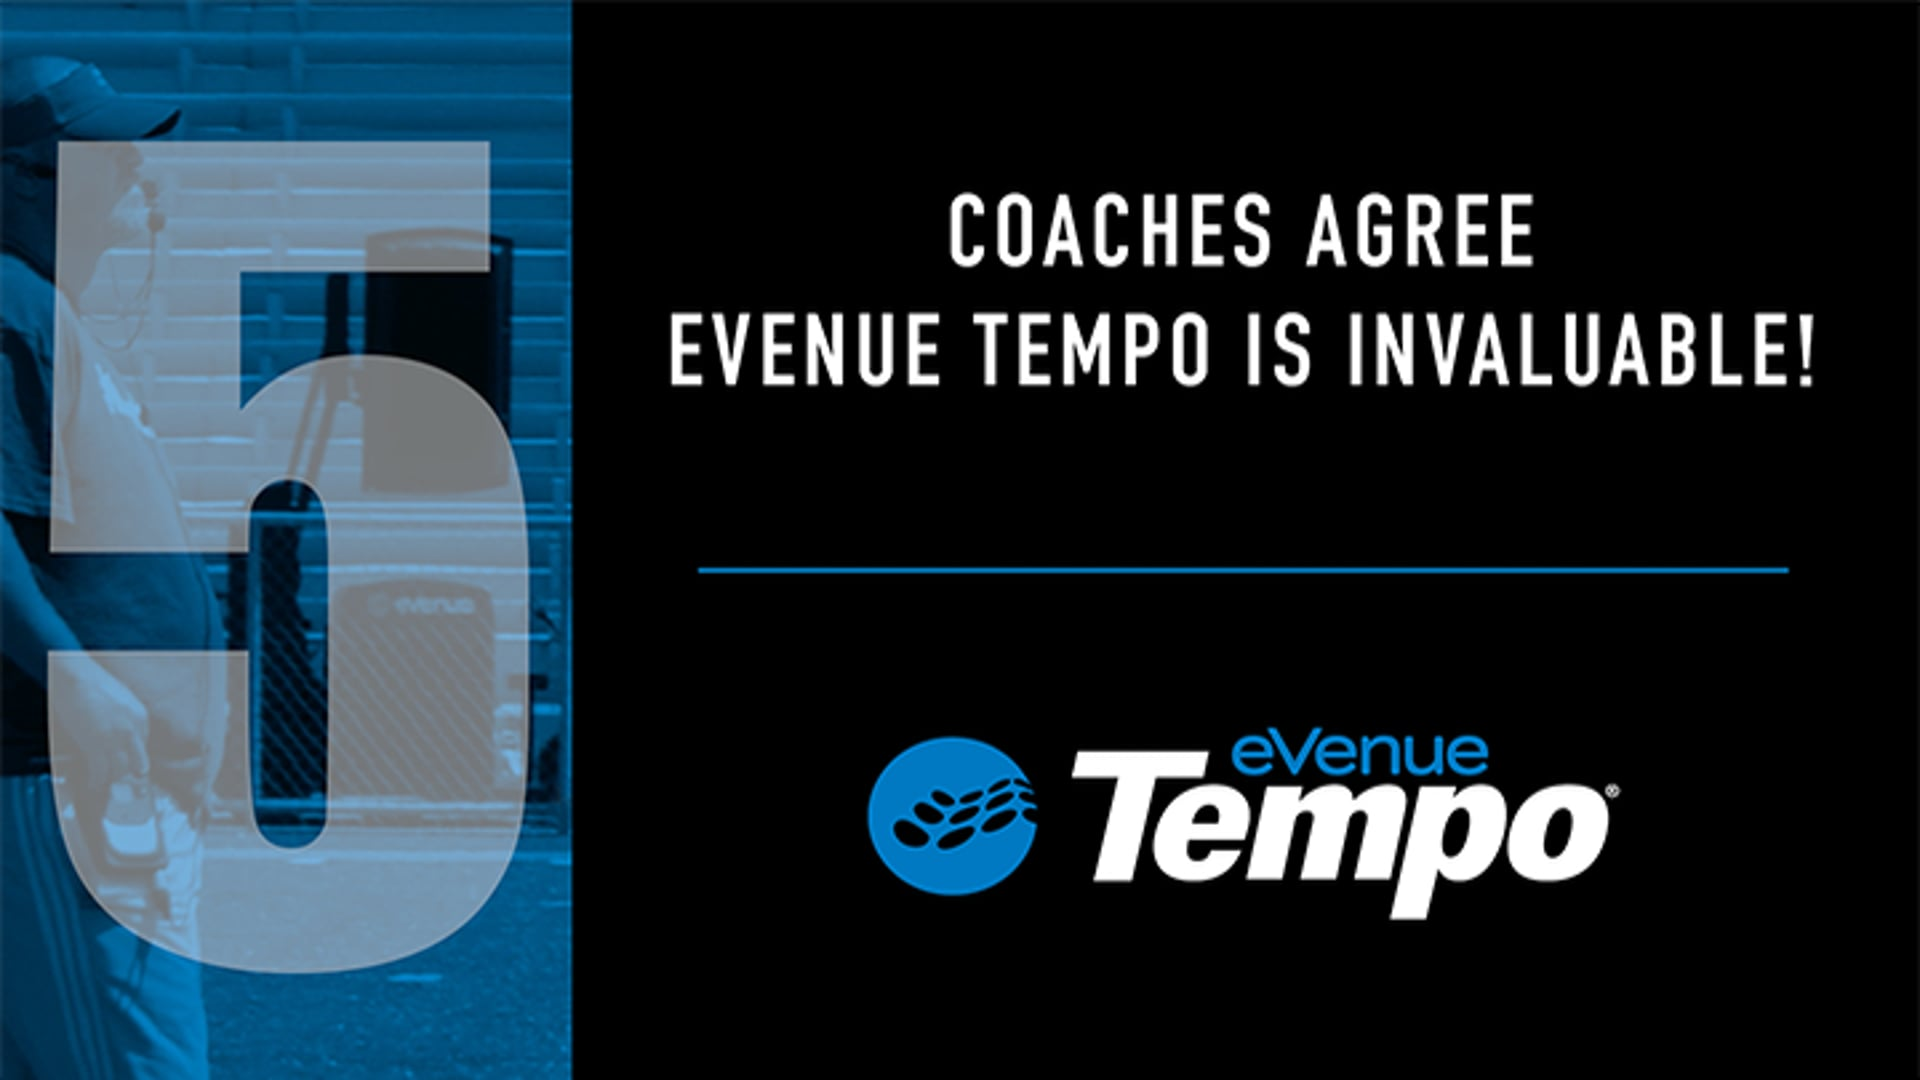 Coaches Agree - eVenue Tempo is Invaluable!